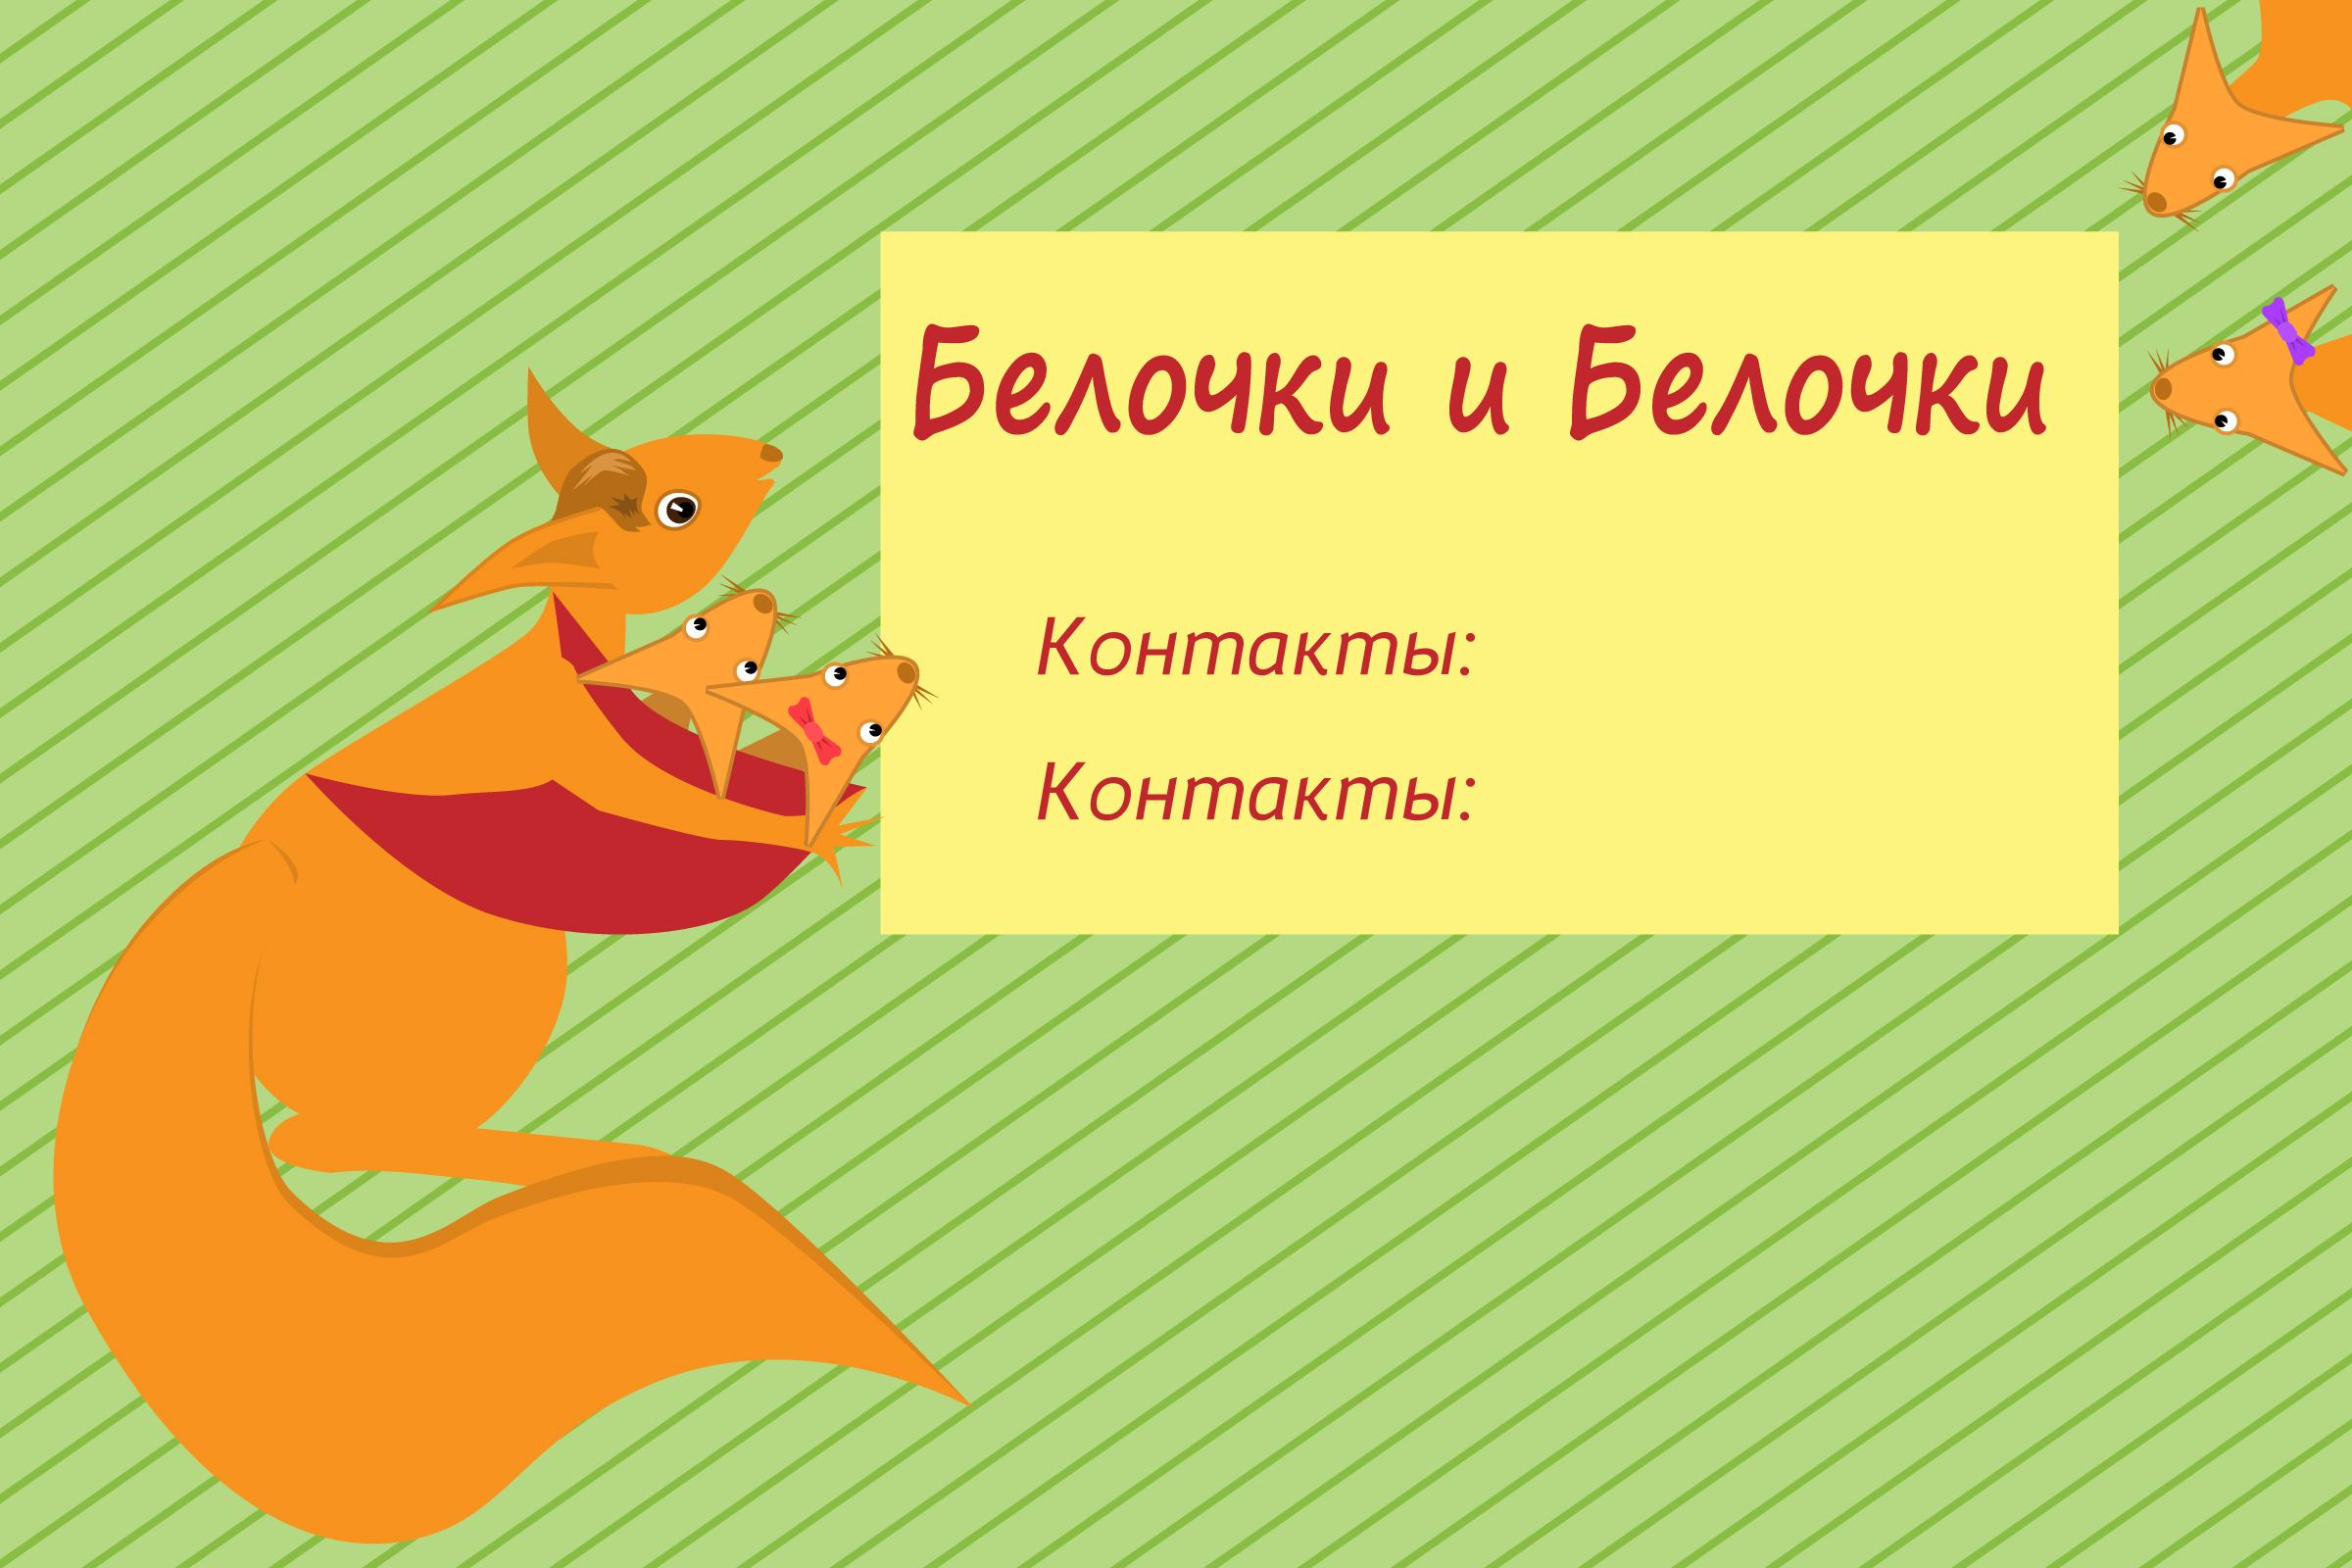 Конкурс на создание макета визиток сообщества мам (белочки). фото f_91159ba6ad00f217.jpg